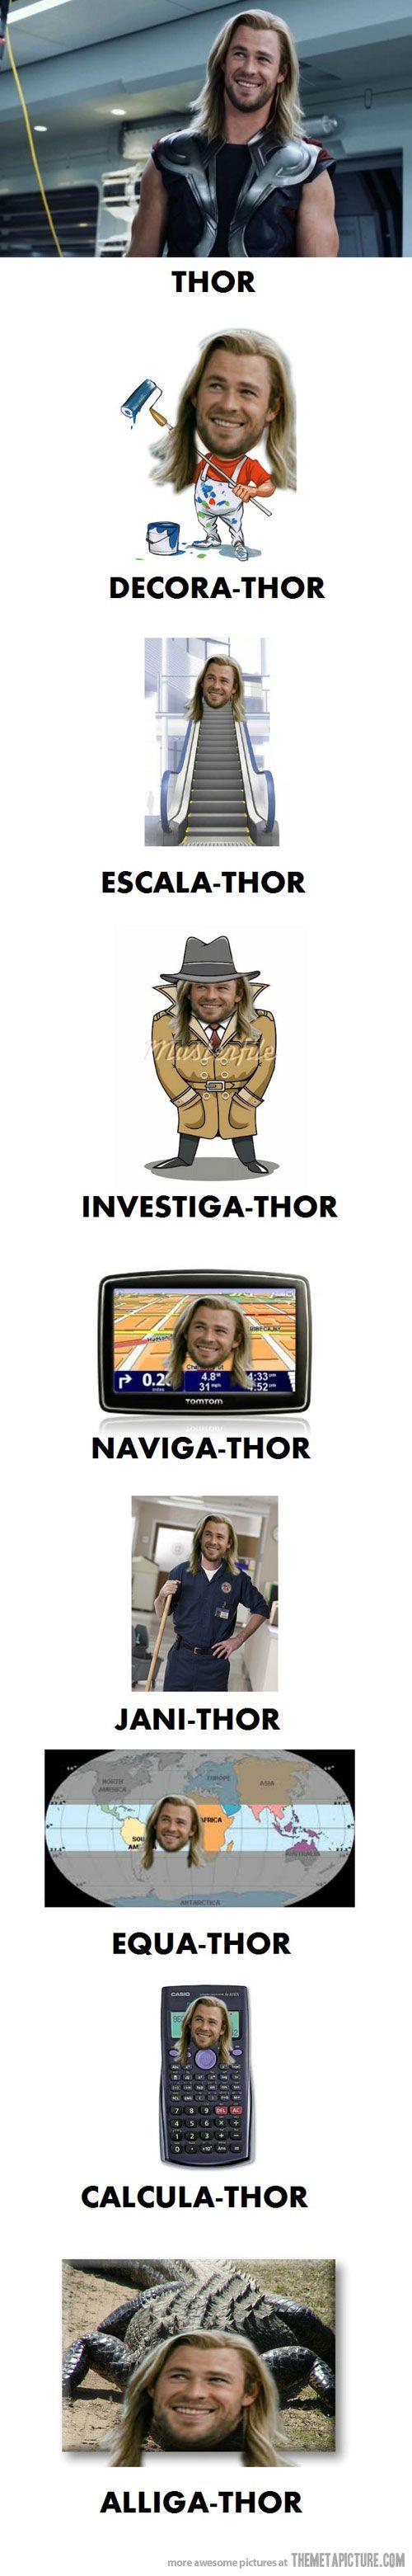 Thor… Thor Everywhere. HAHAHA OH MY GOD I LOLD SO HARD